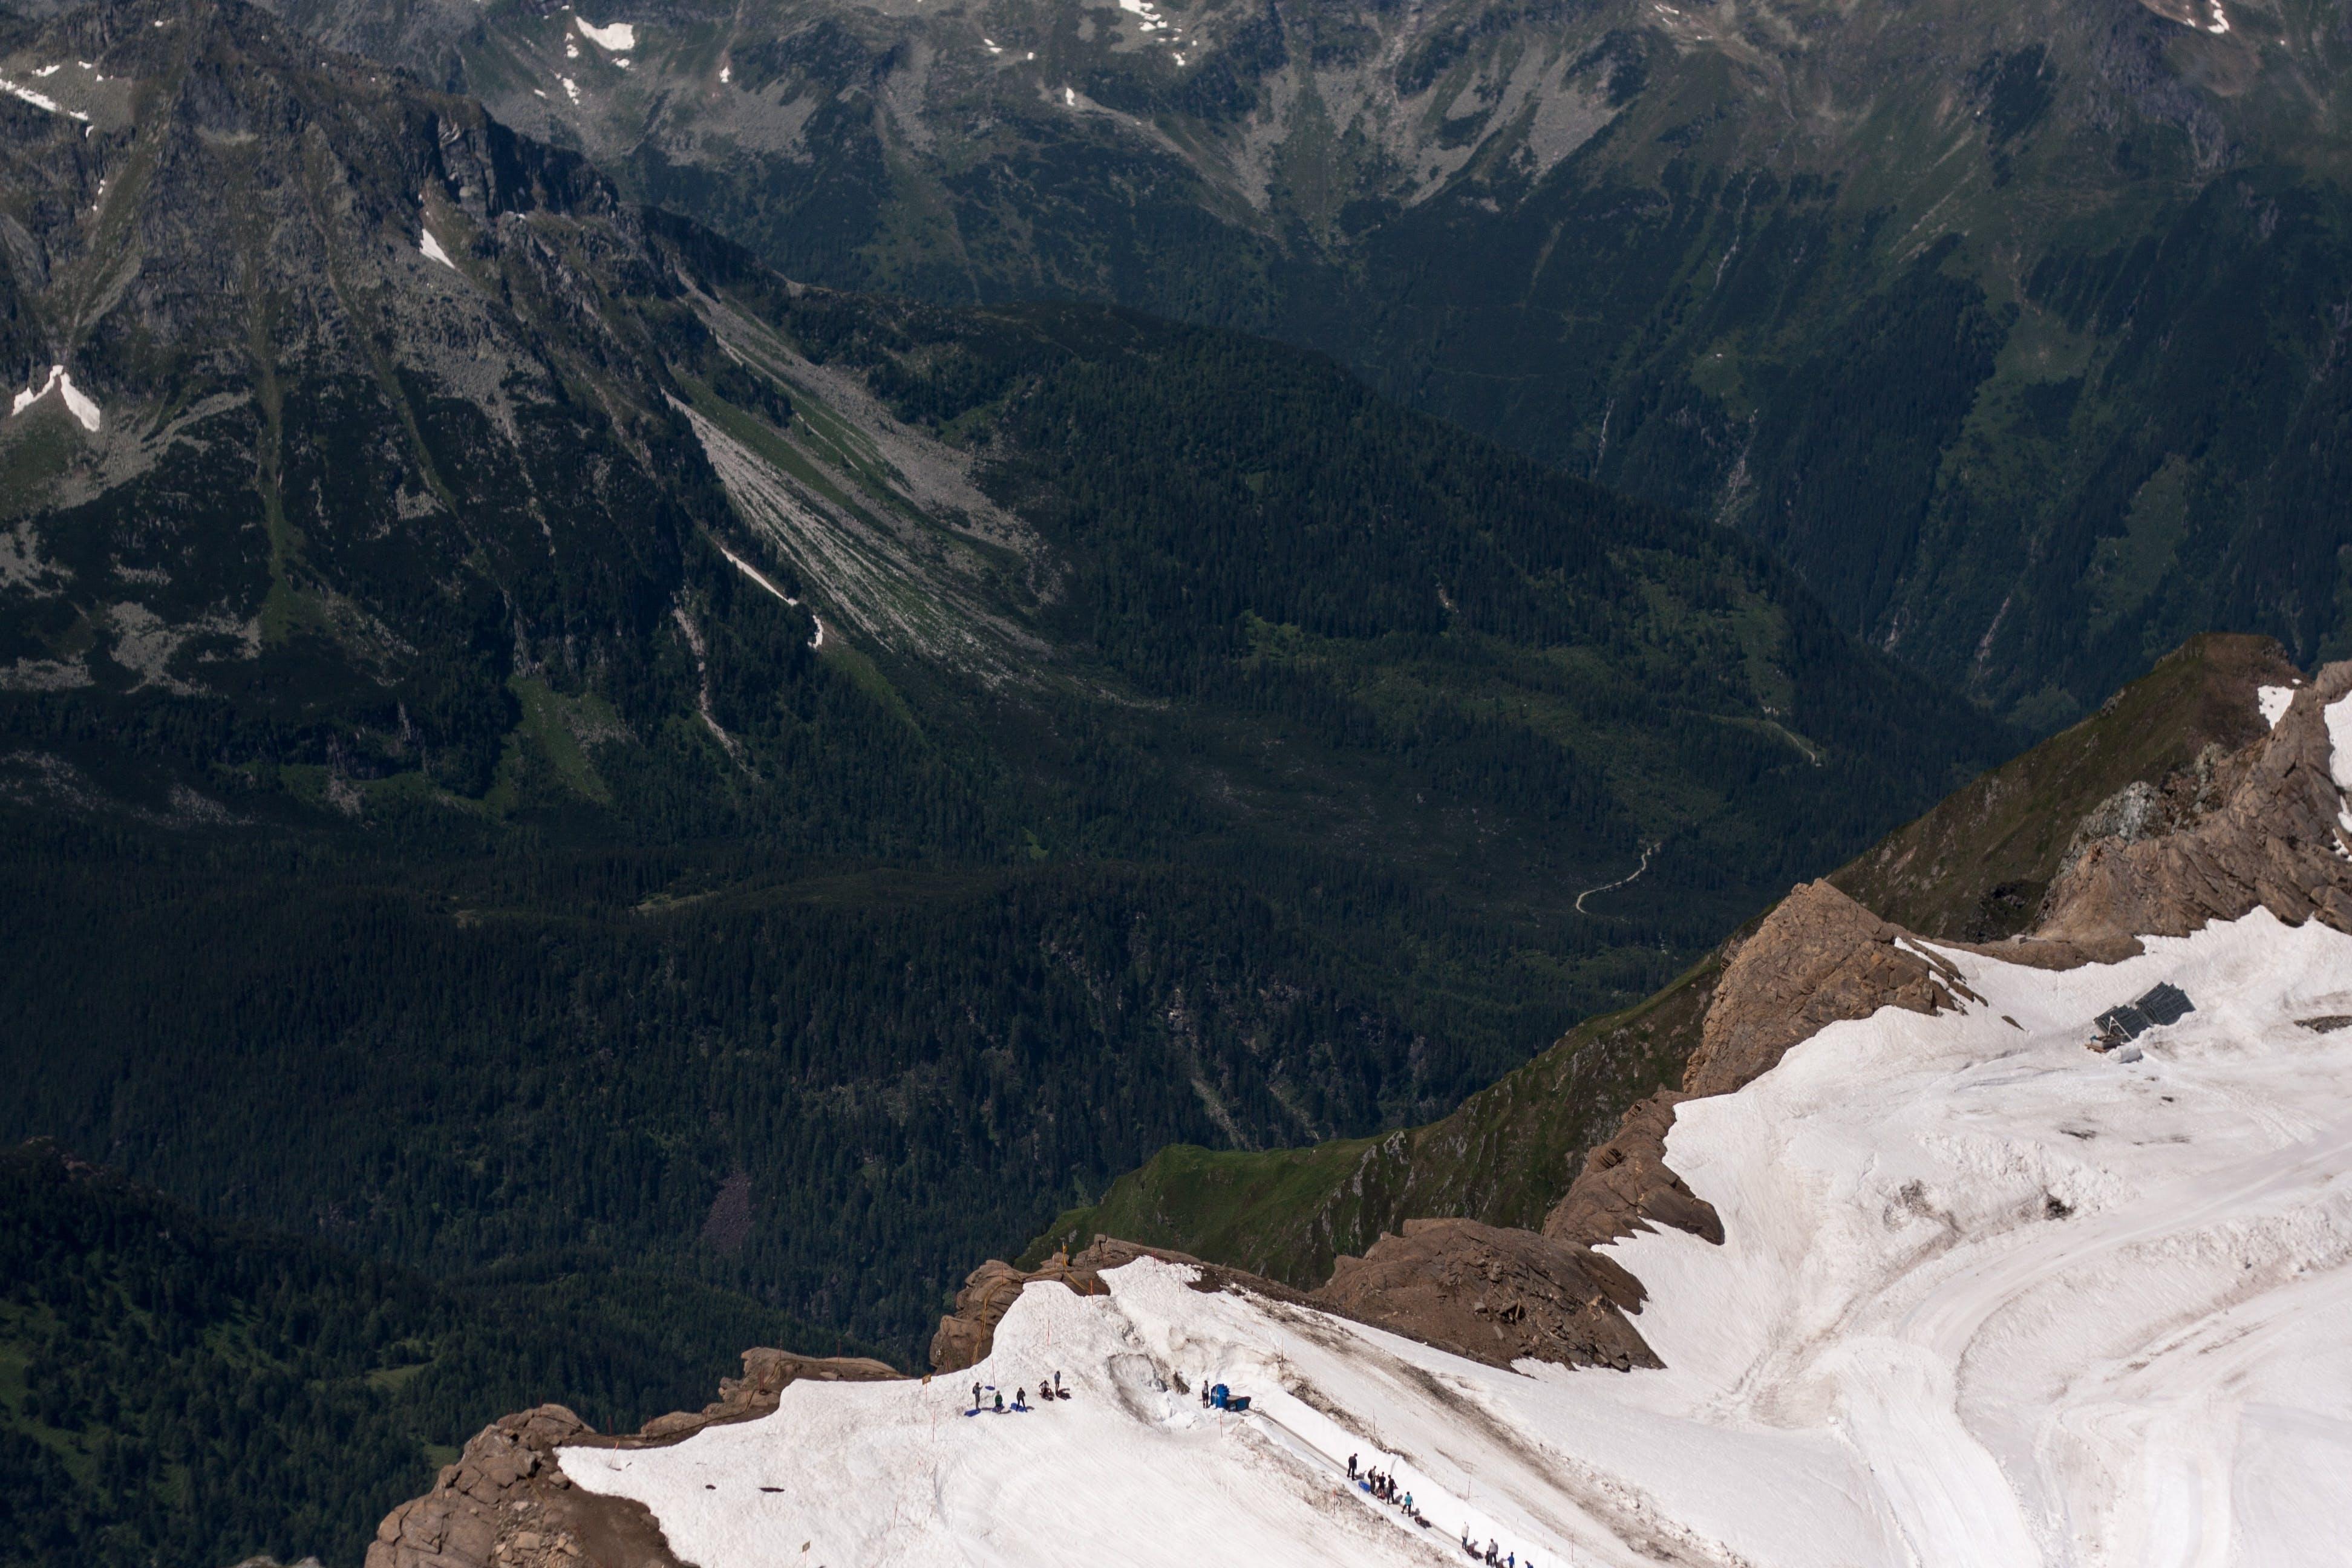 Raum Gletscher #alpenkrise